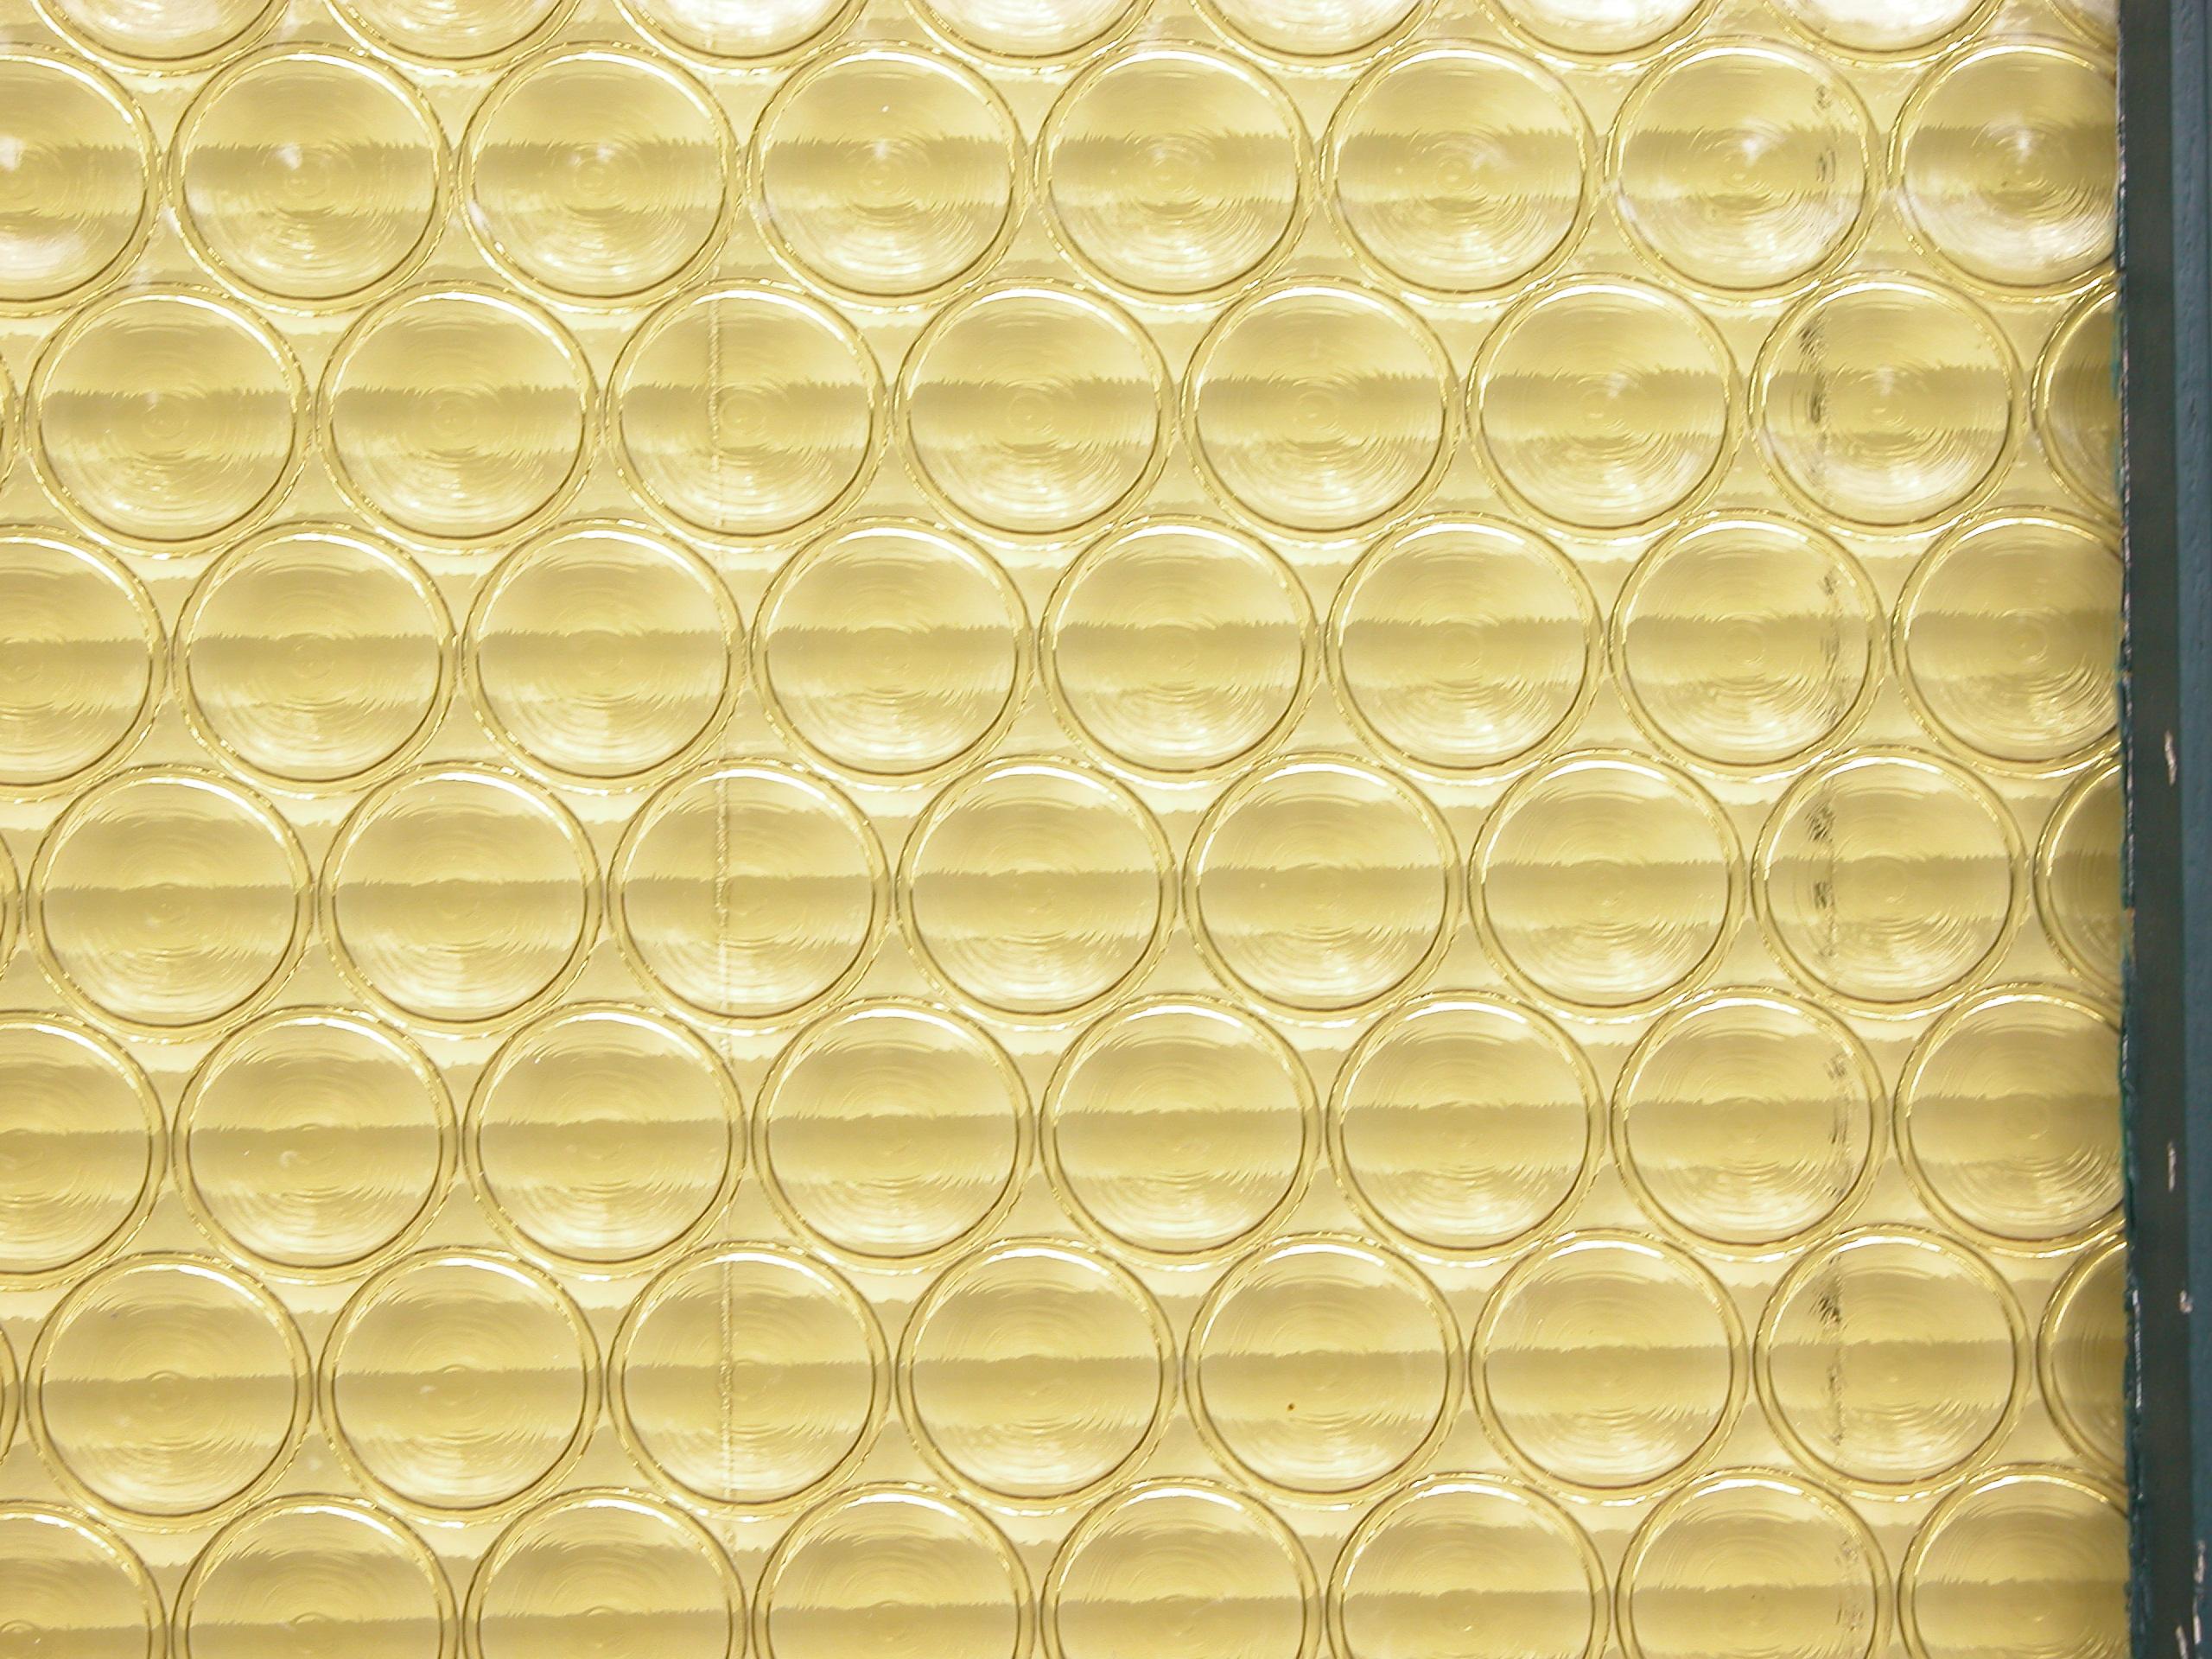 yellow glase pane of a door circles